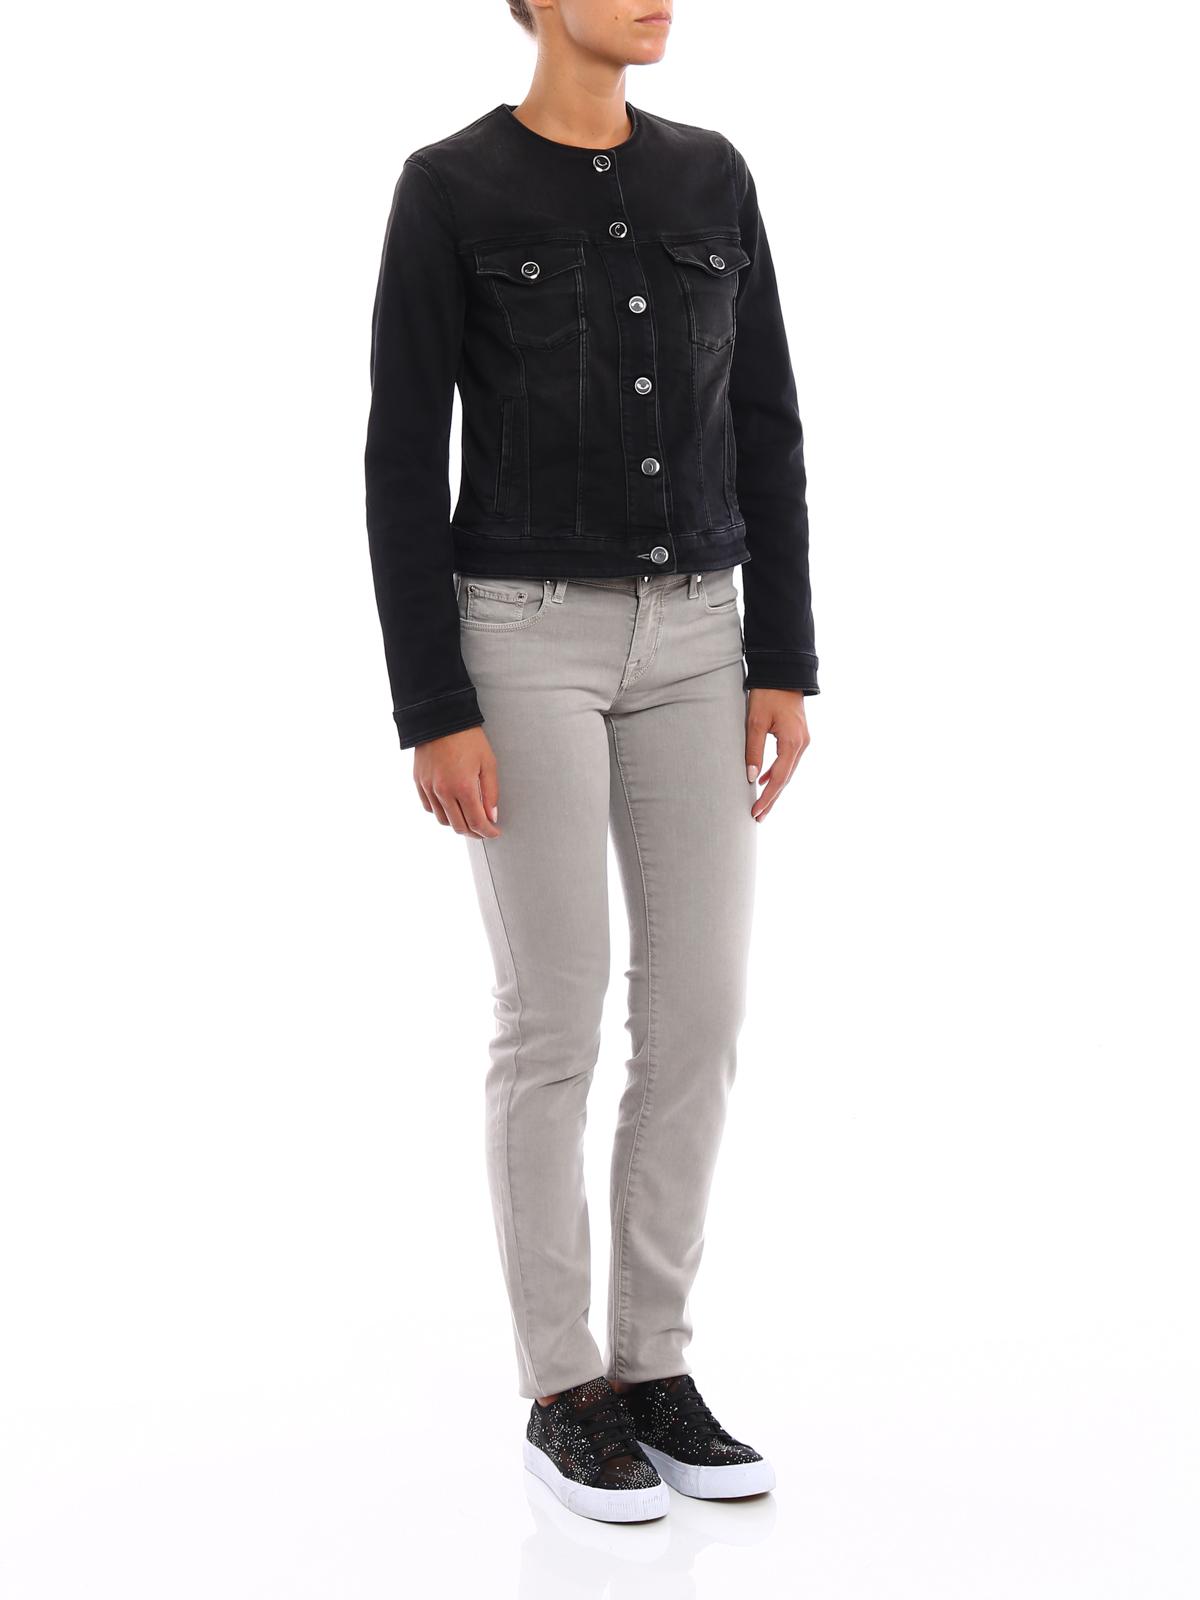 jeansjacke schwarz von jacob cohen jeansjacken ikrix. Black Bedroom Furniture Sets. Home Design Ideas